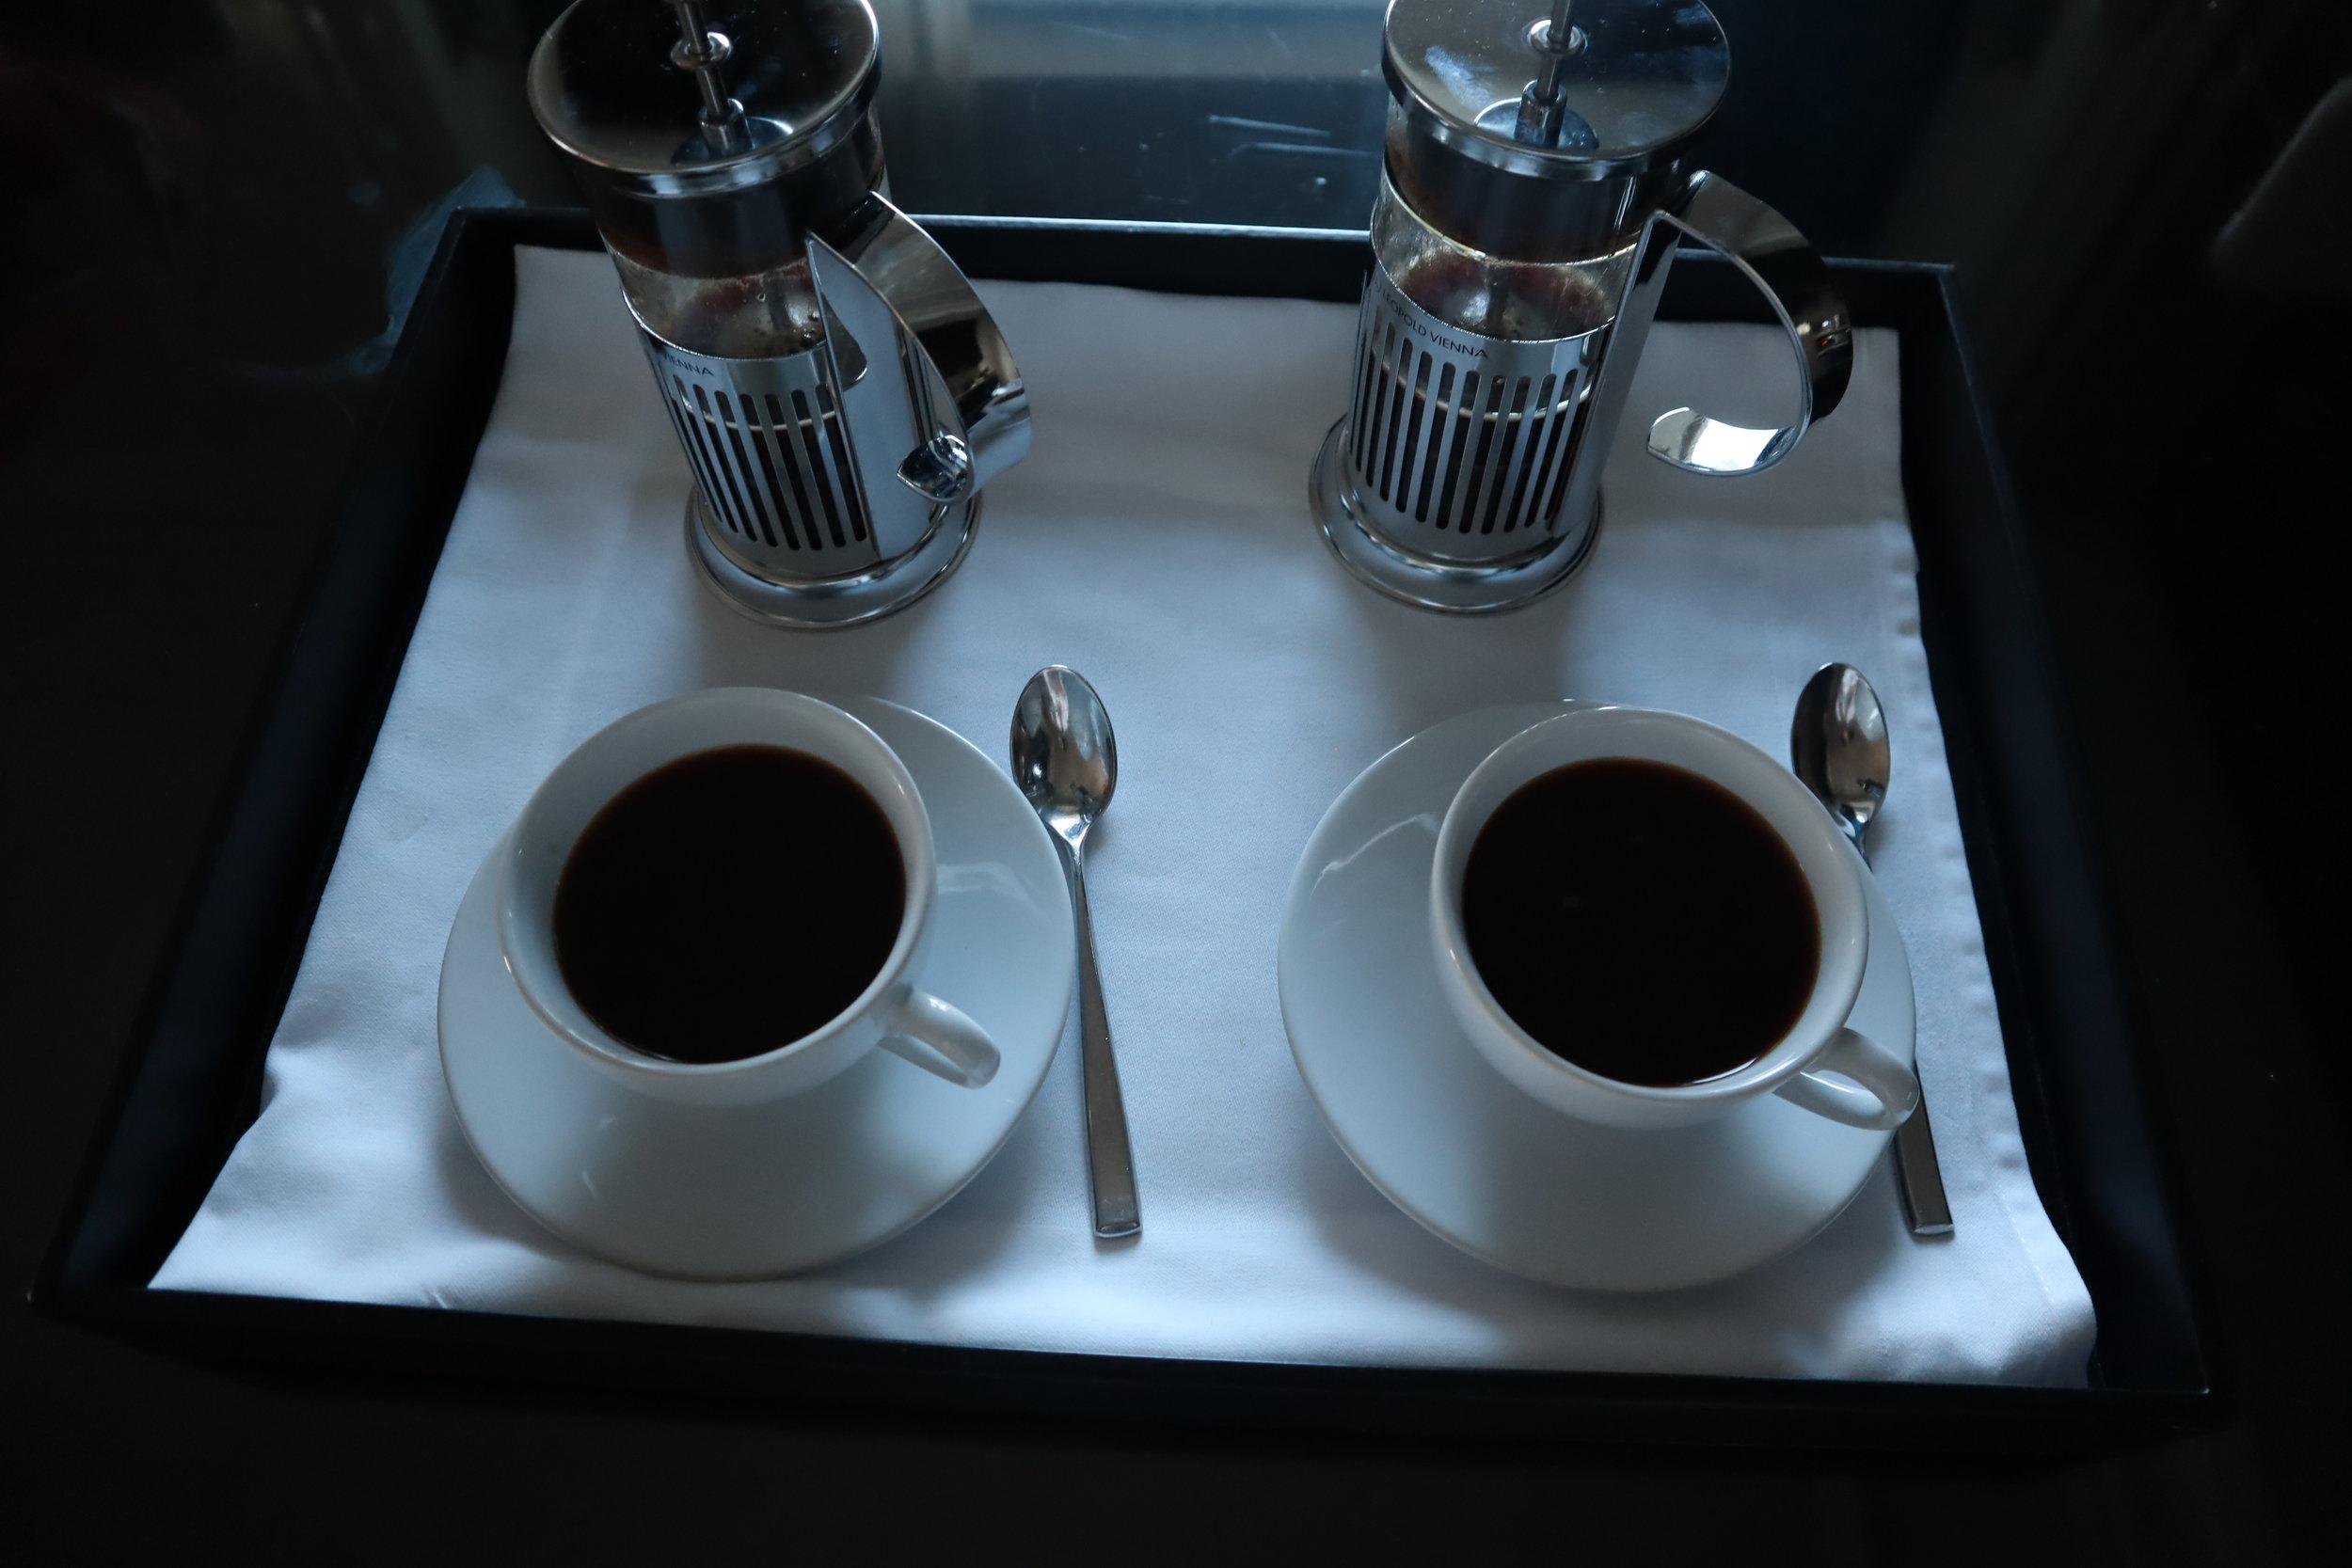 St. Regis Toronto – Morning beverage service